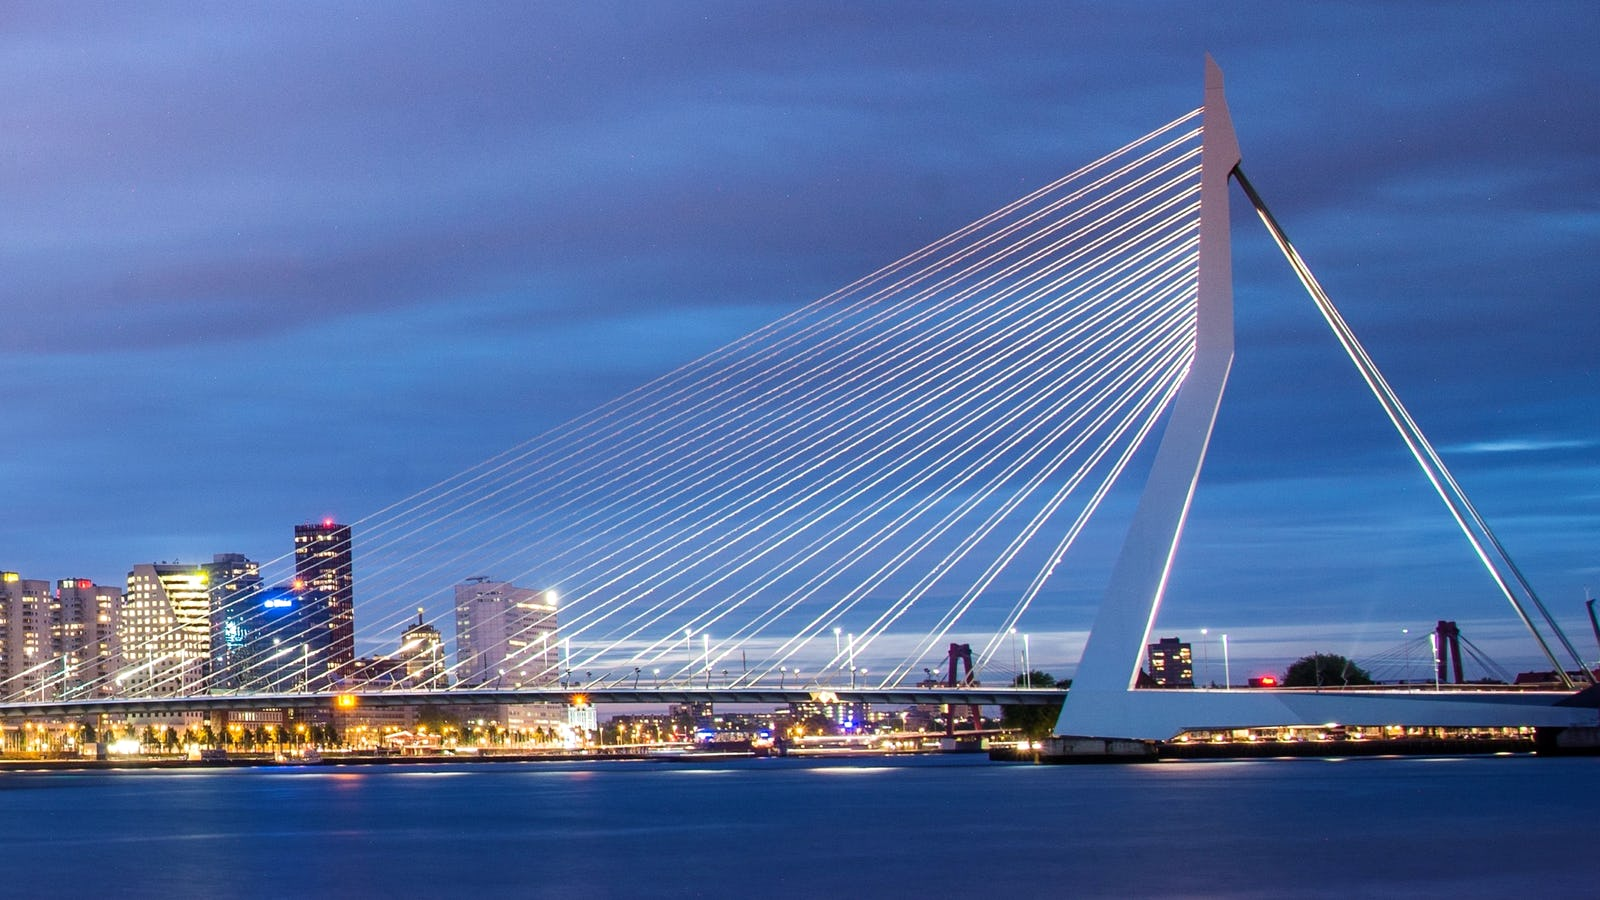 Erasmusbrug - Rotterdam - CitySpotters